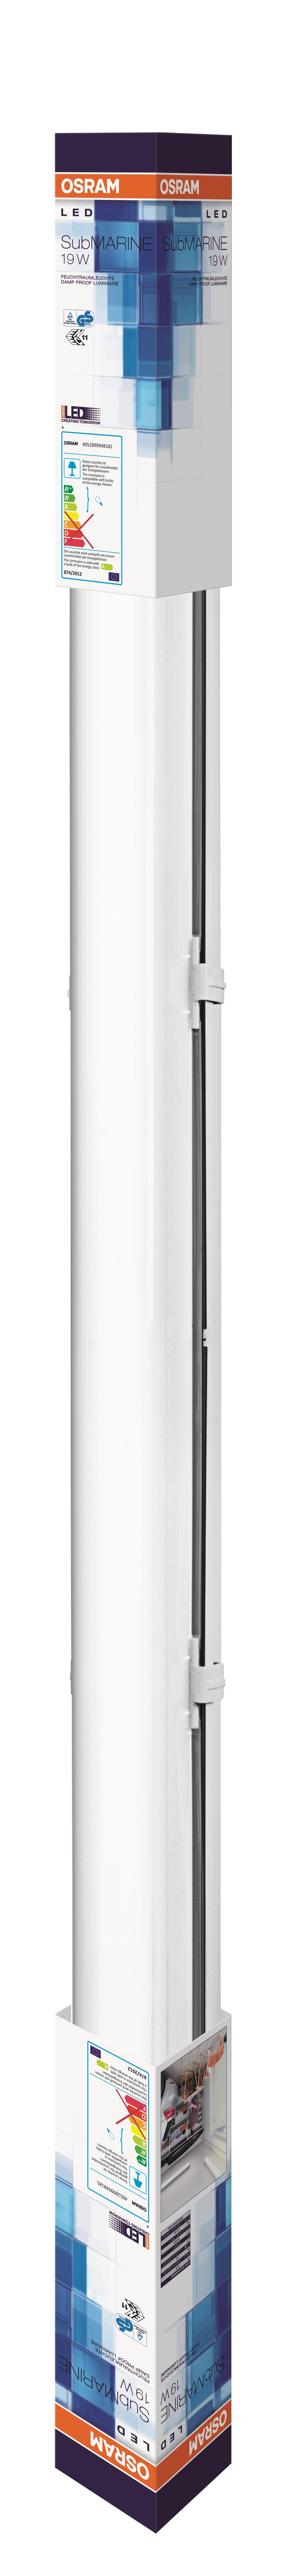 Feuchtraumleuchte LED SubMarine 15W/840 4000K, 126cm, IP65